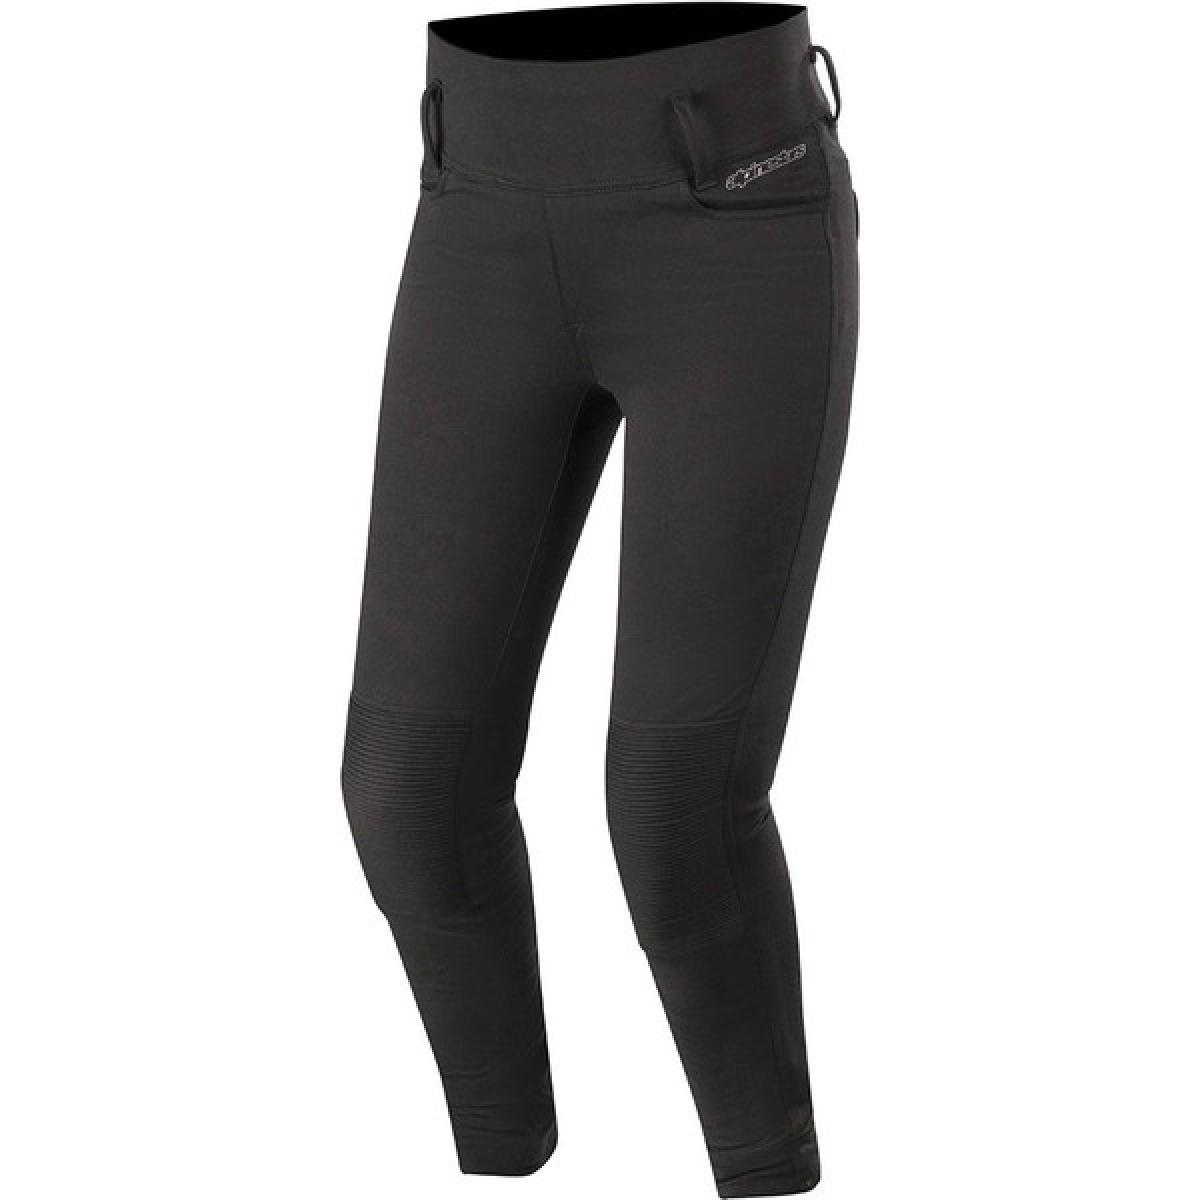 Mujer Leggings Banshee Negro Alpinestars trdosChxQB